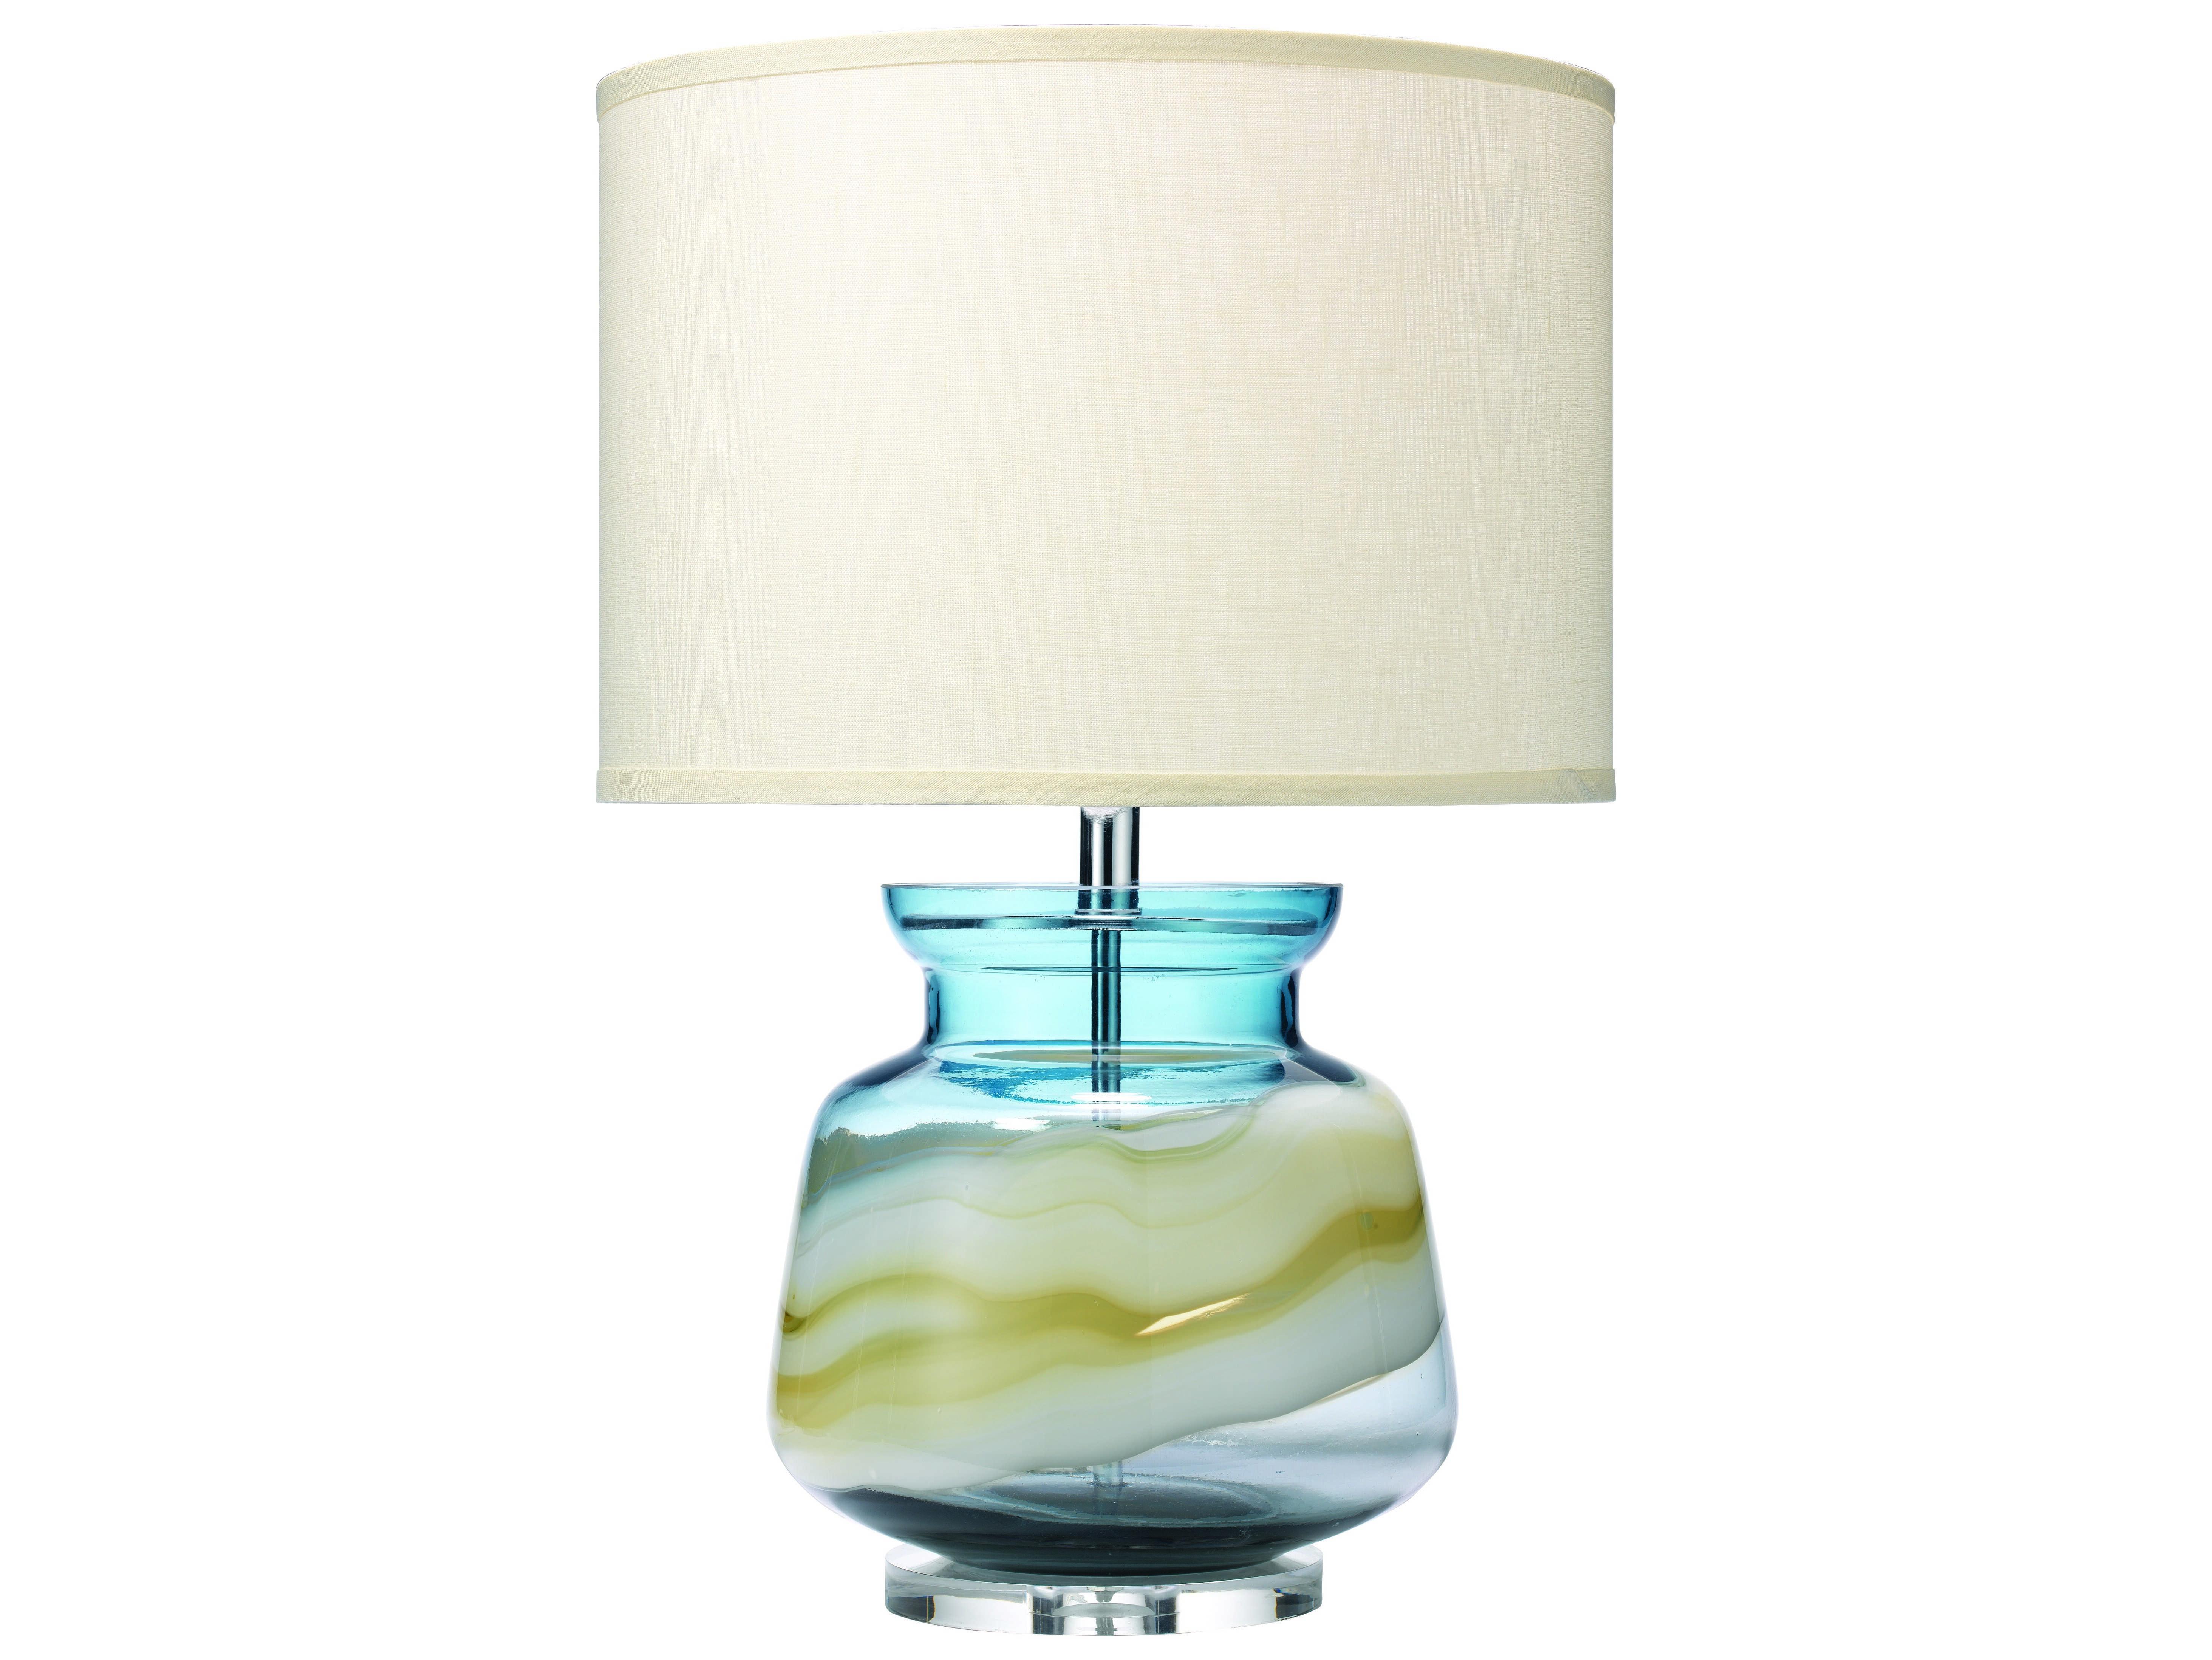 Jamie Young Company Ursula Blue Swirl Glass Buffet Lamp